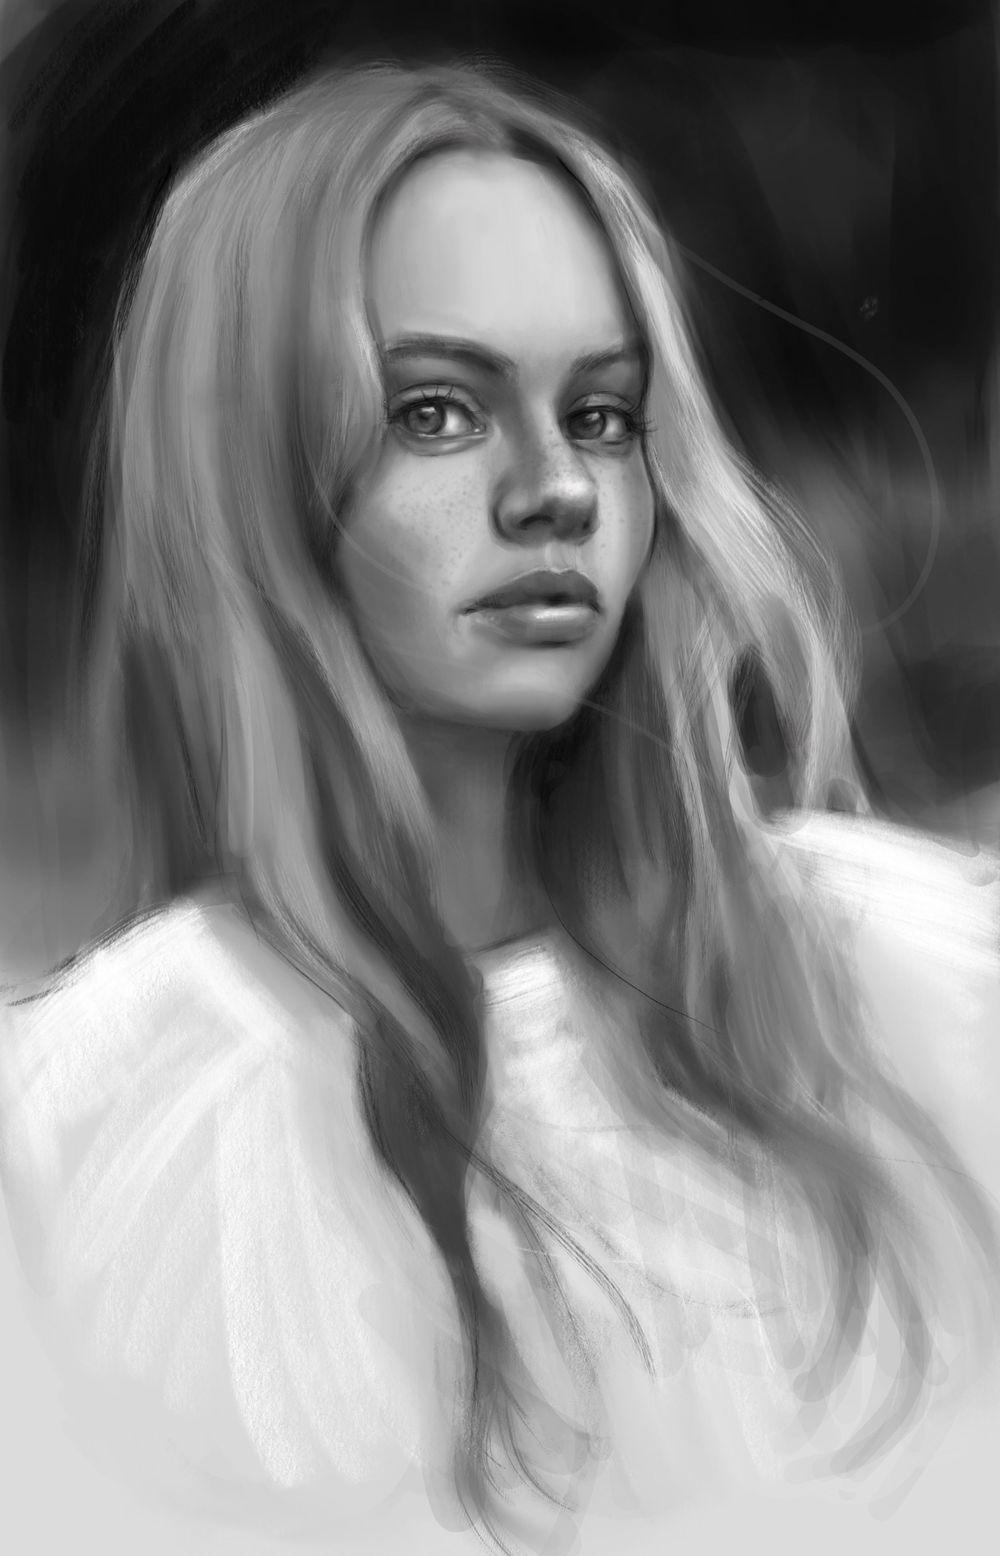 Portraits - image 20 - student project